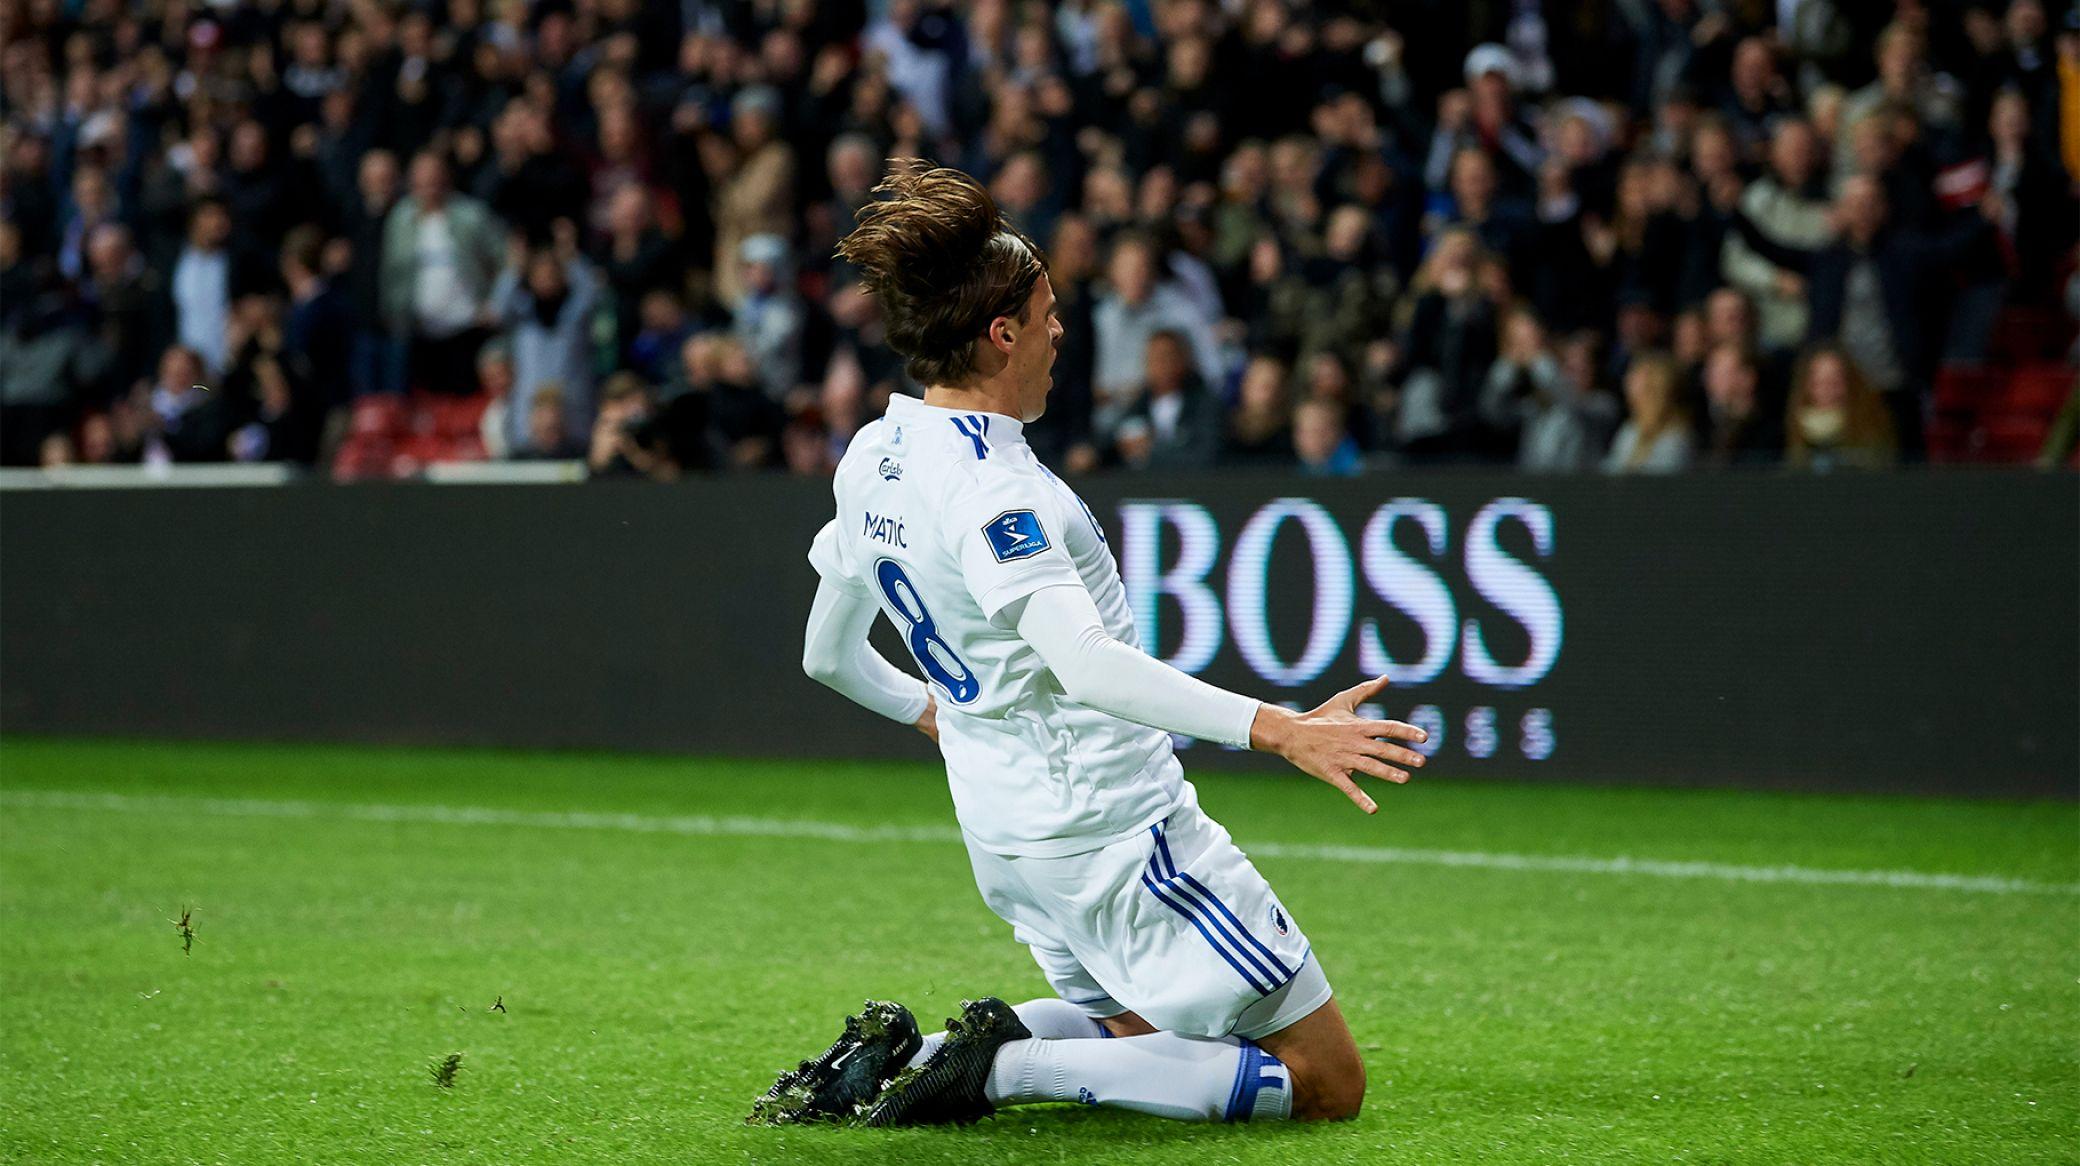 Uroš celebrates the goal; photo: Lars Rønbøg, Getty Images